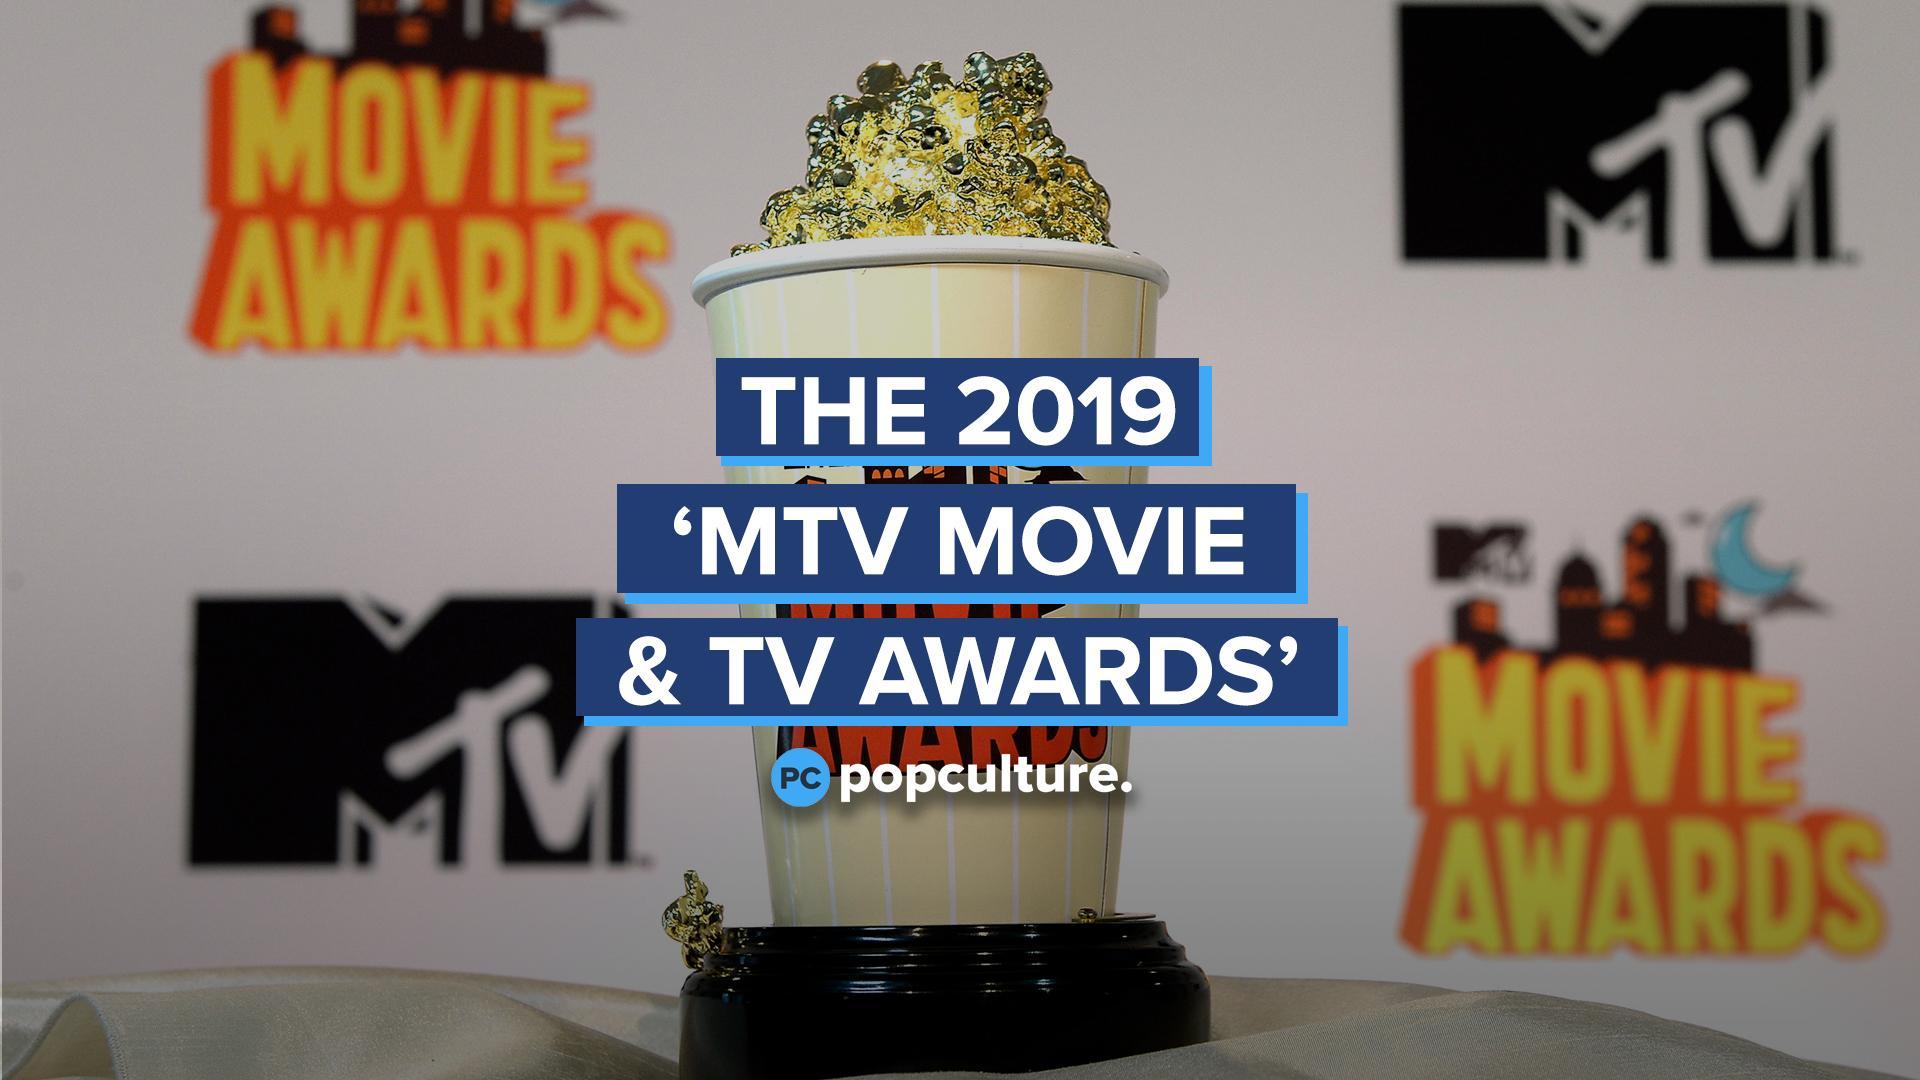 2019 MTV MOVIE & TV AWARDS Highlights screen capture